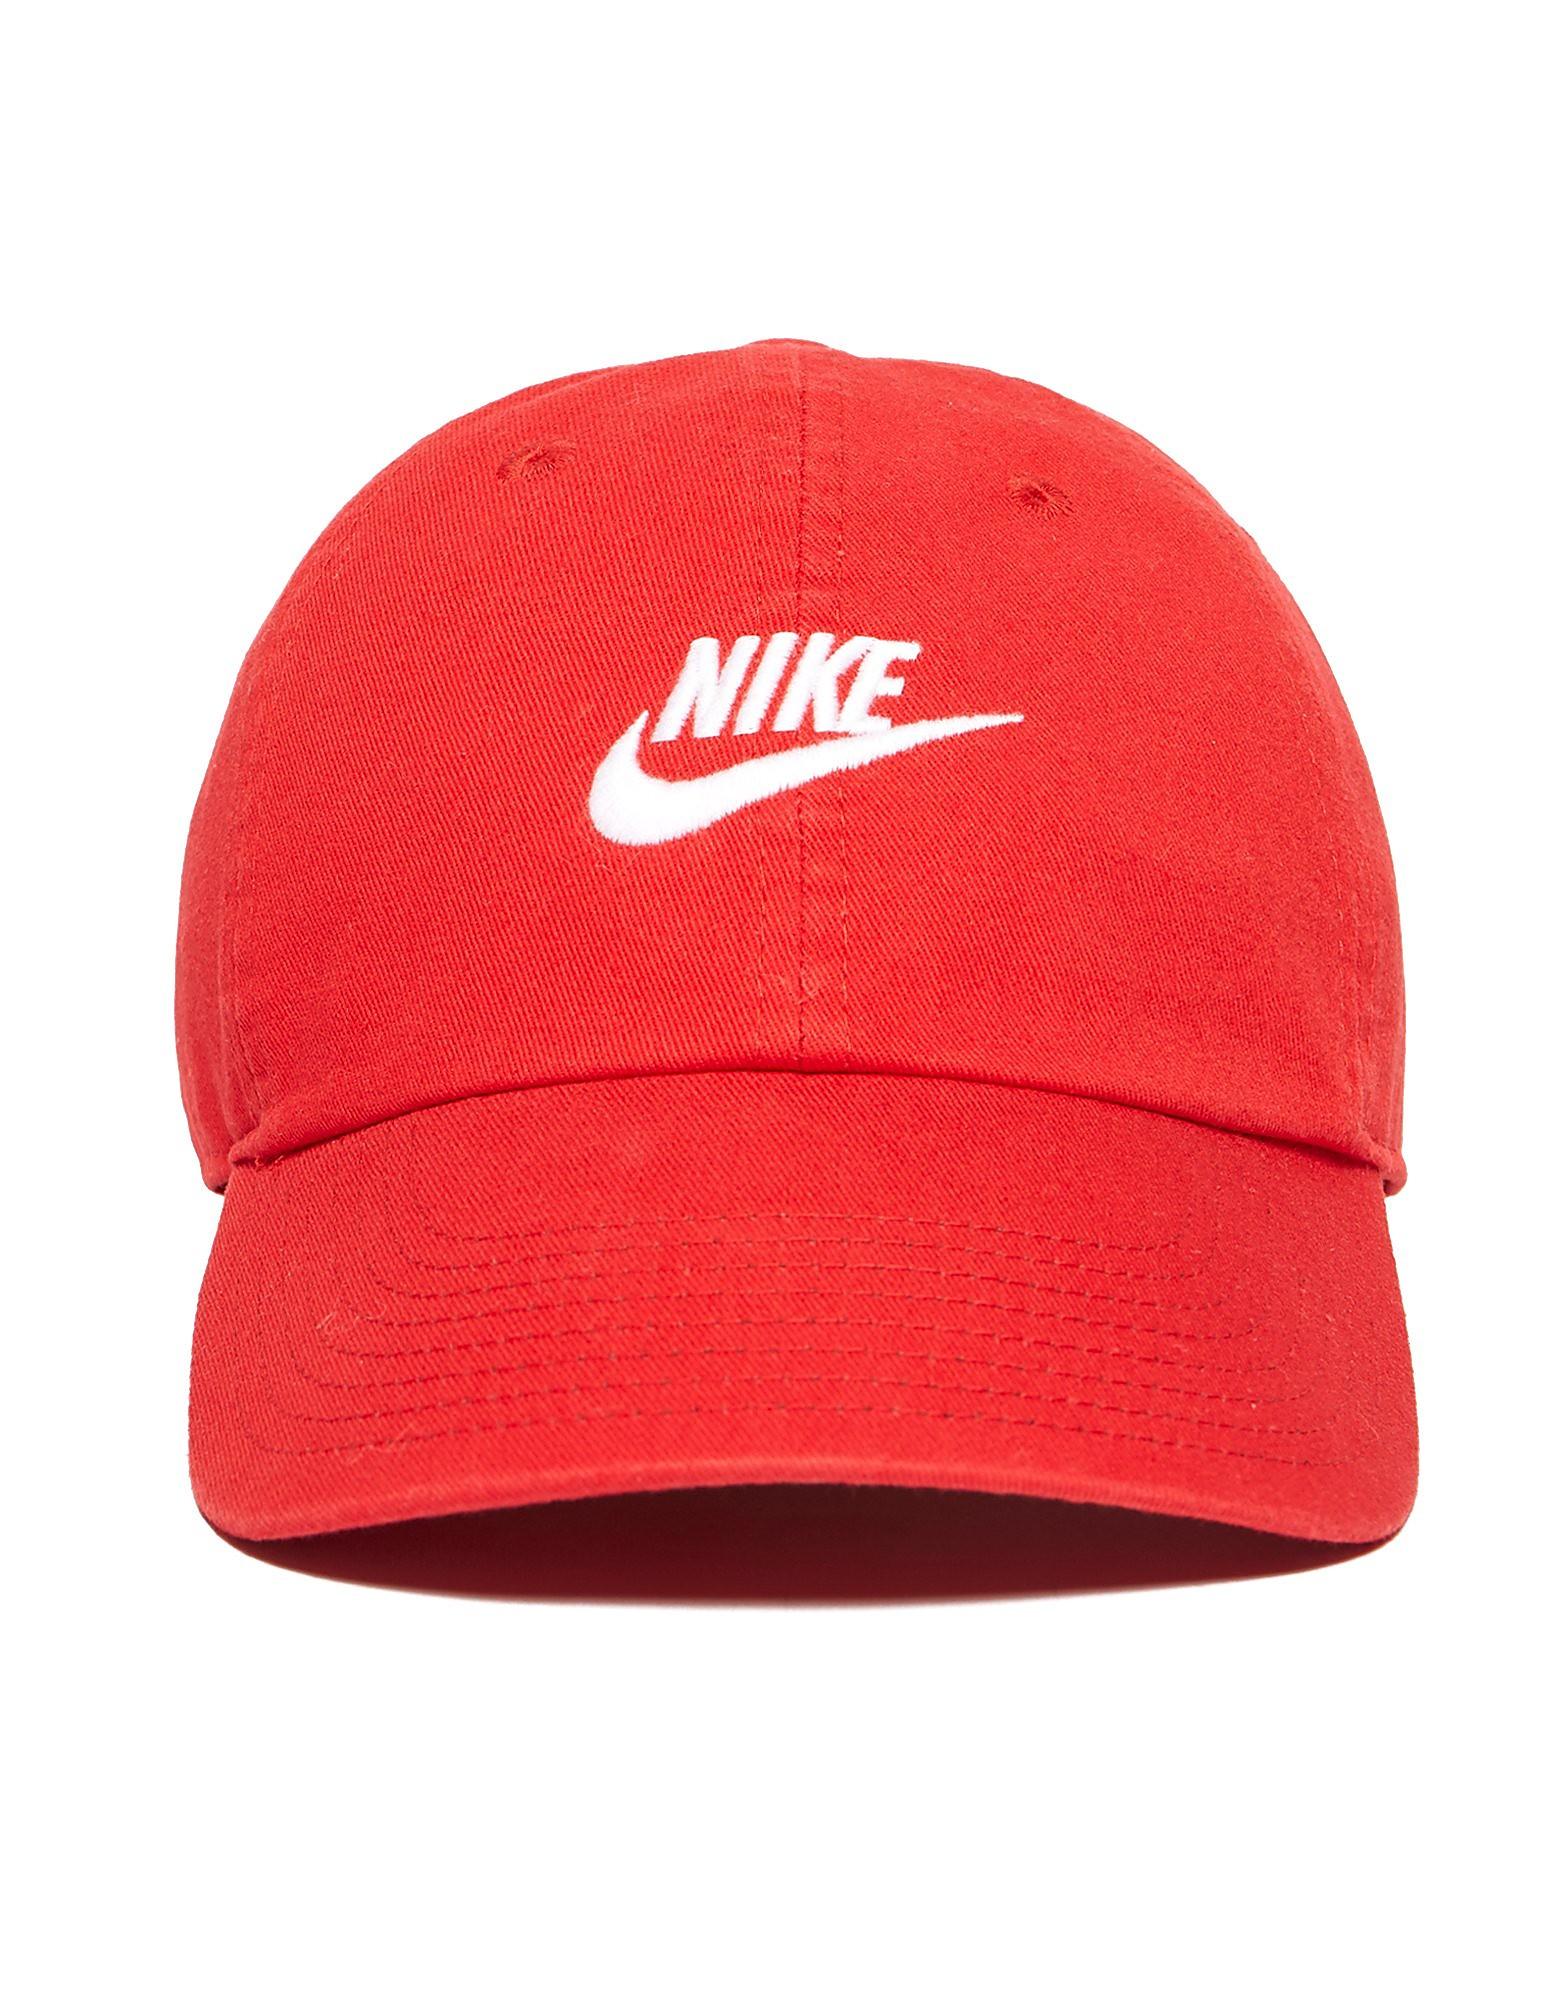 Nike Futura Washed Kappe Rot